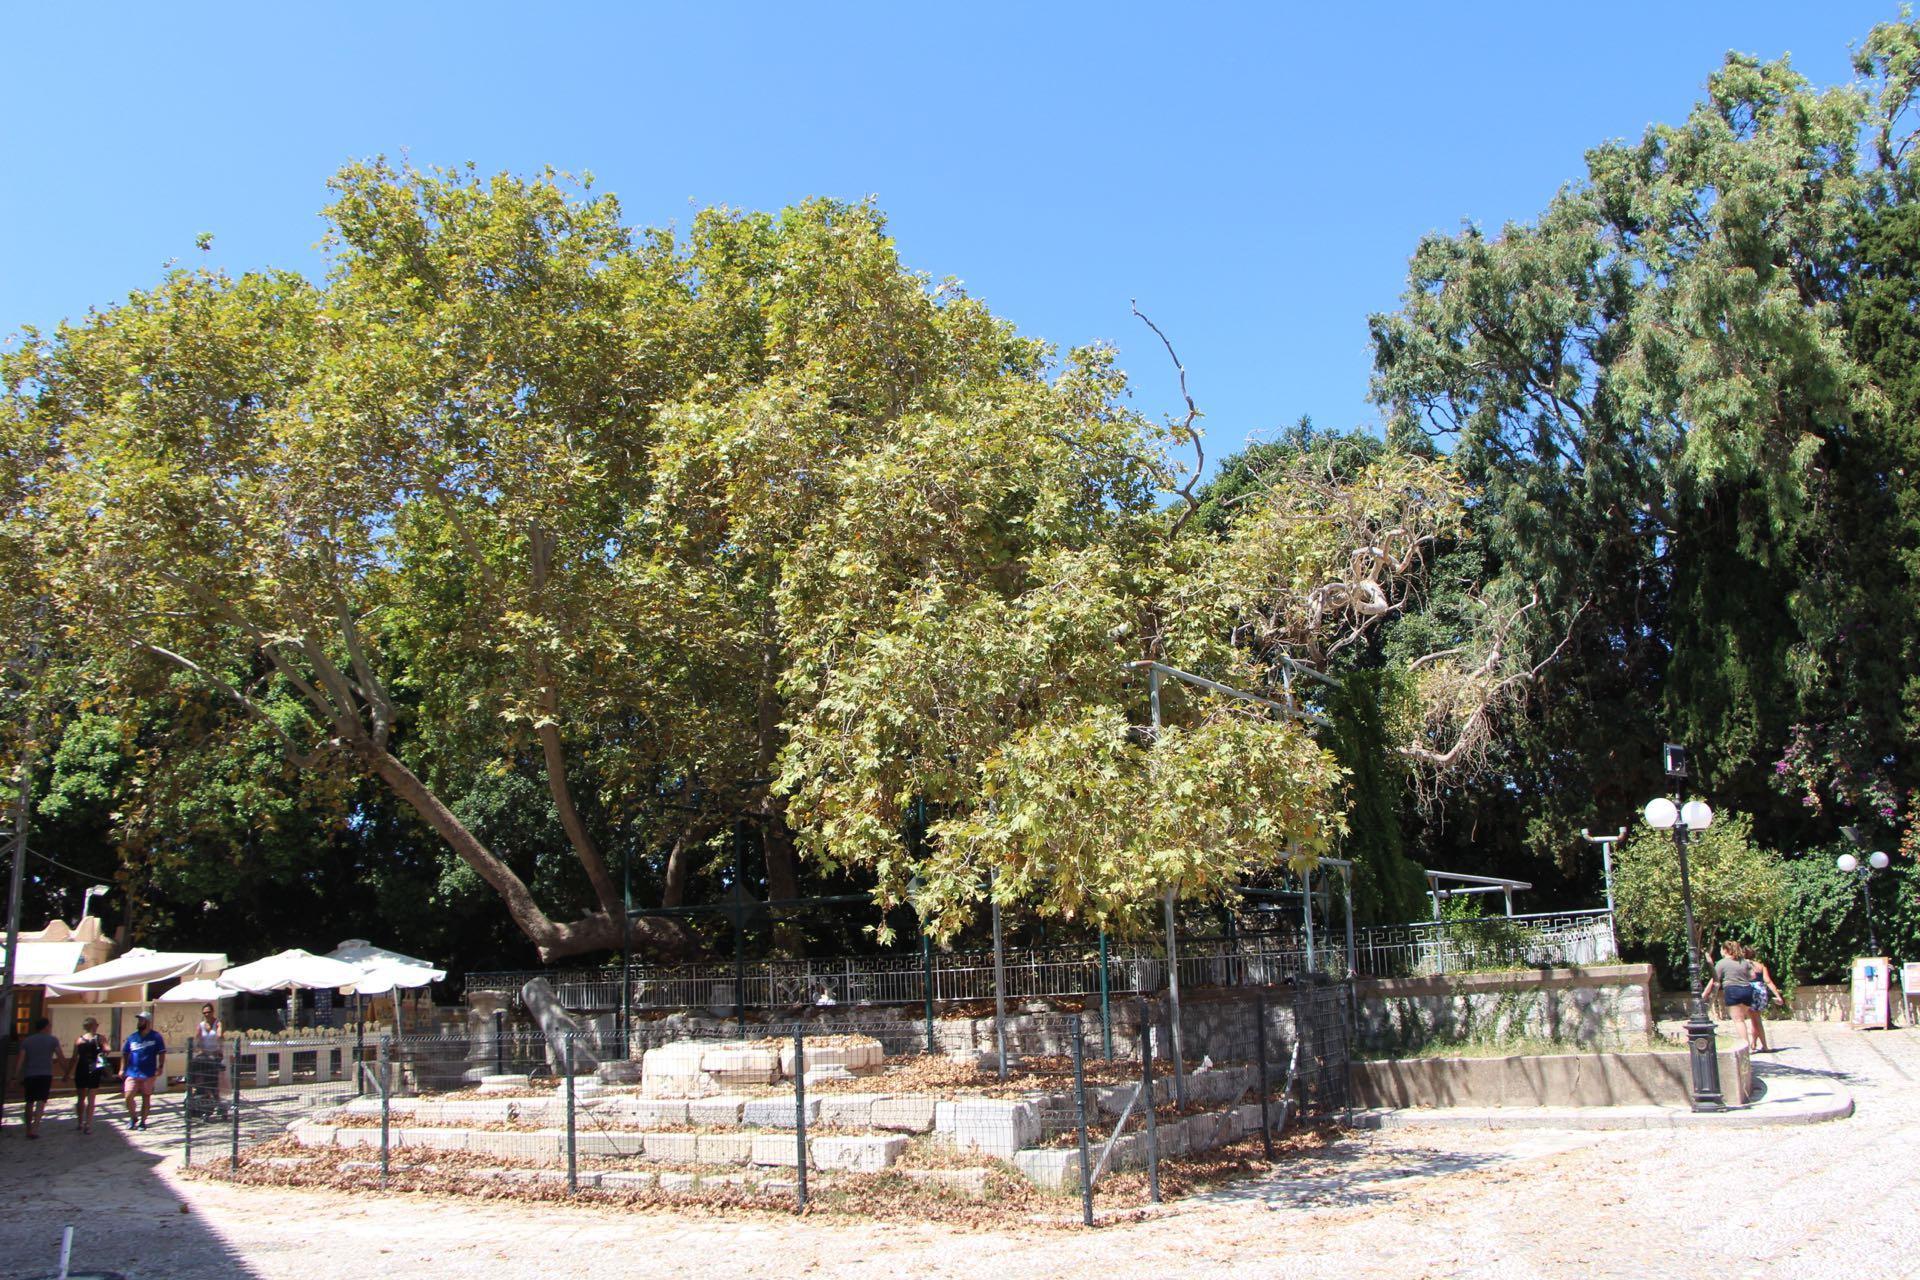 The plane tree of Hippocrates